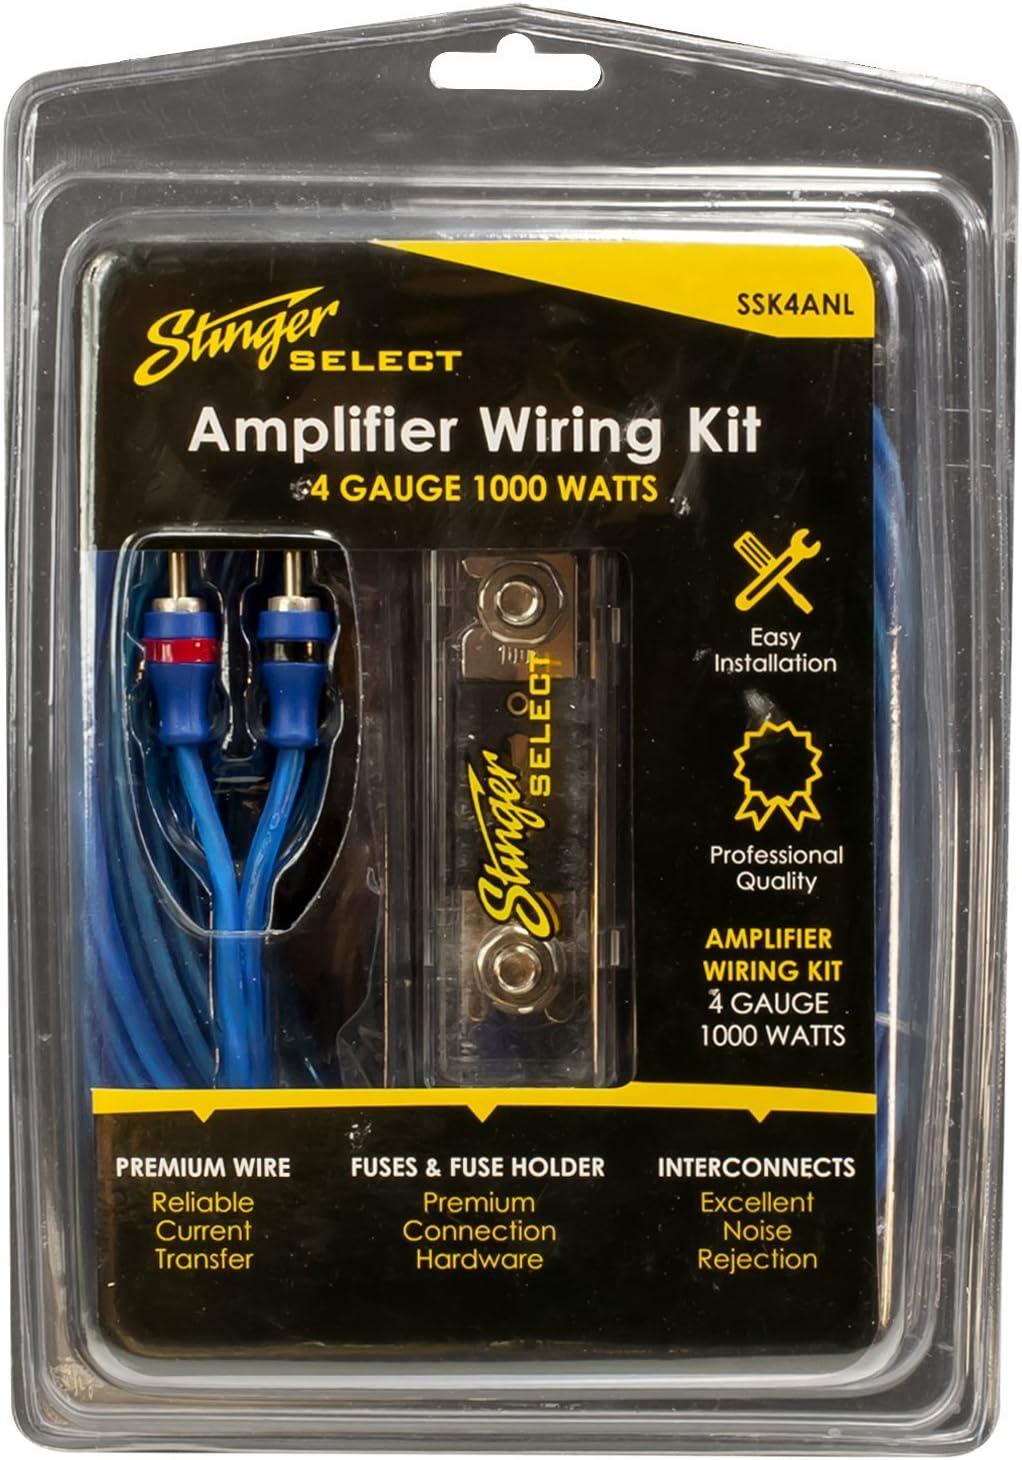 Amazon.com: STINGER SSK4ANL 4Ga 1000W Complete Wiring Kit, Blue, 10.25